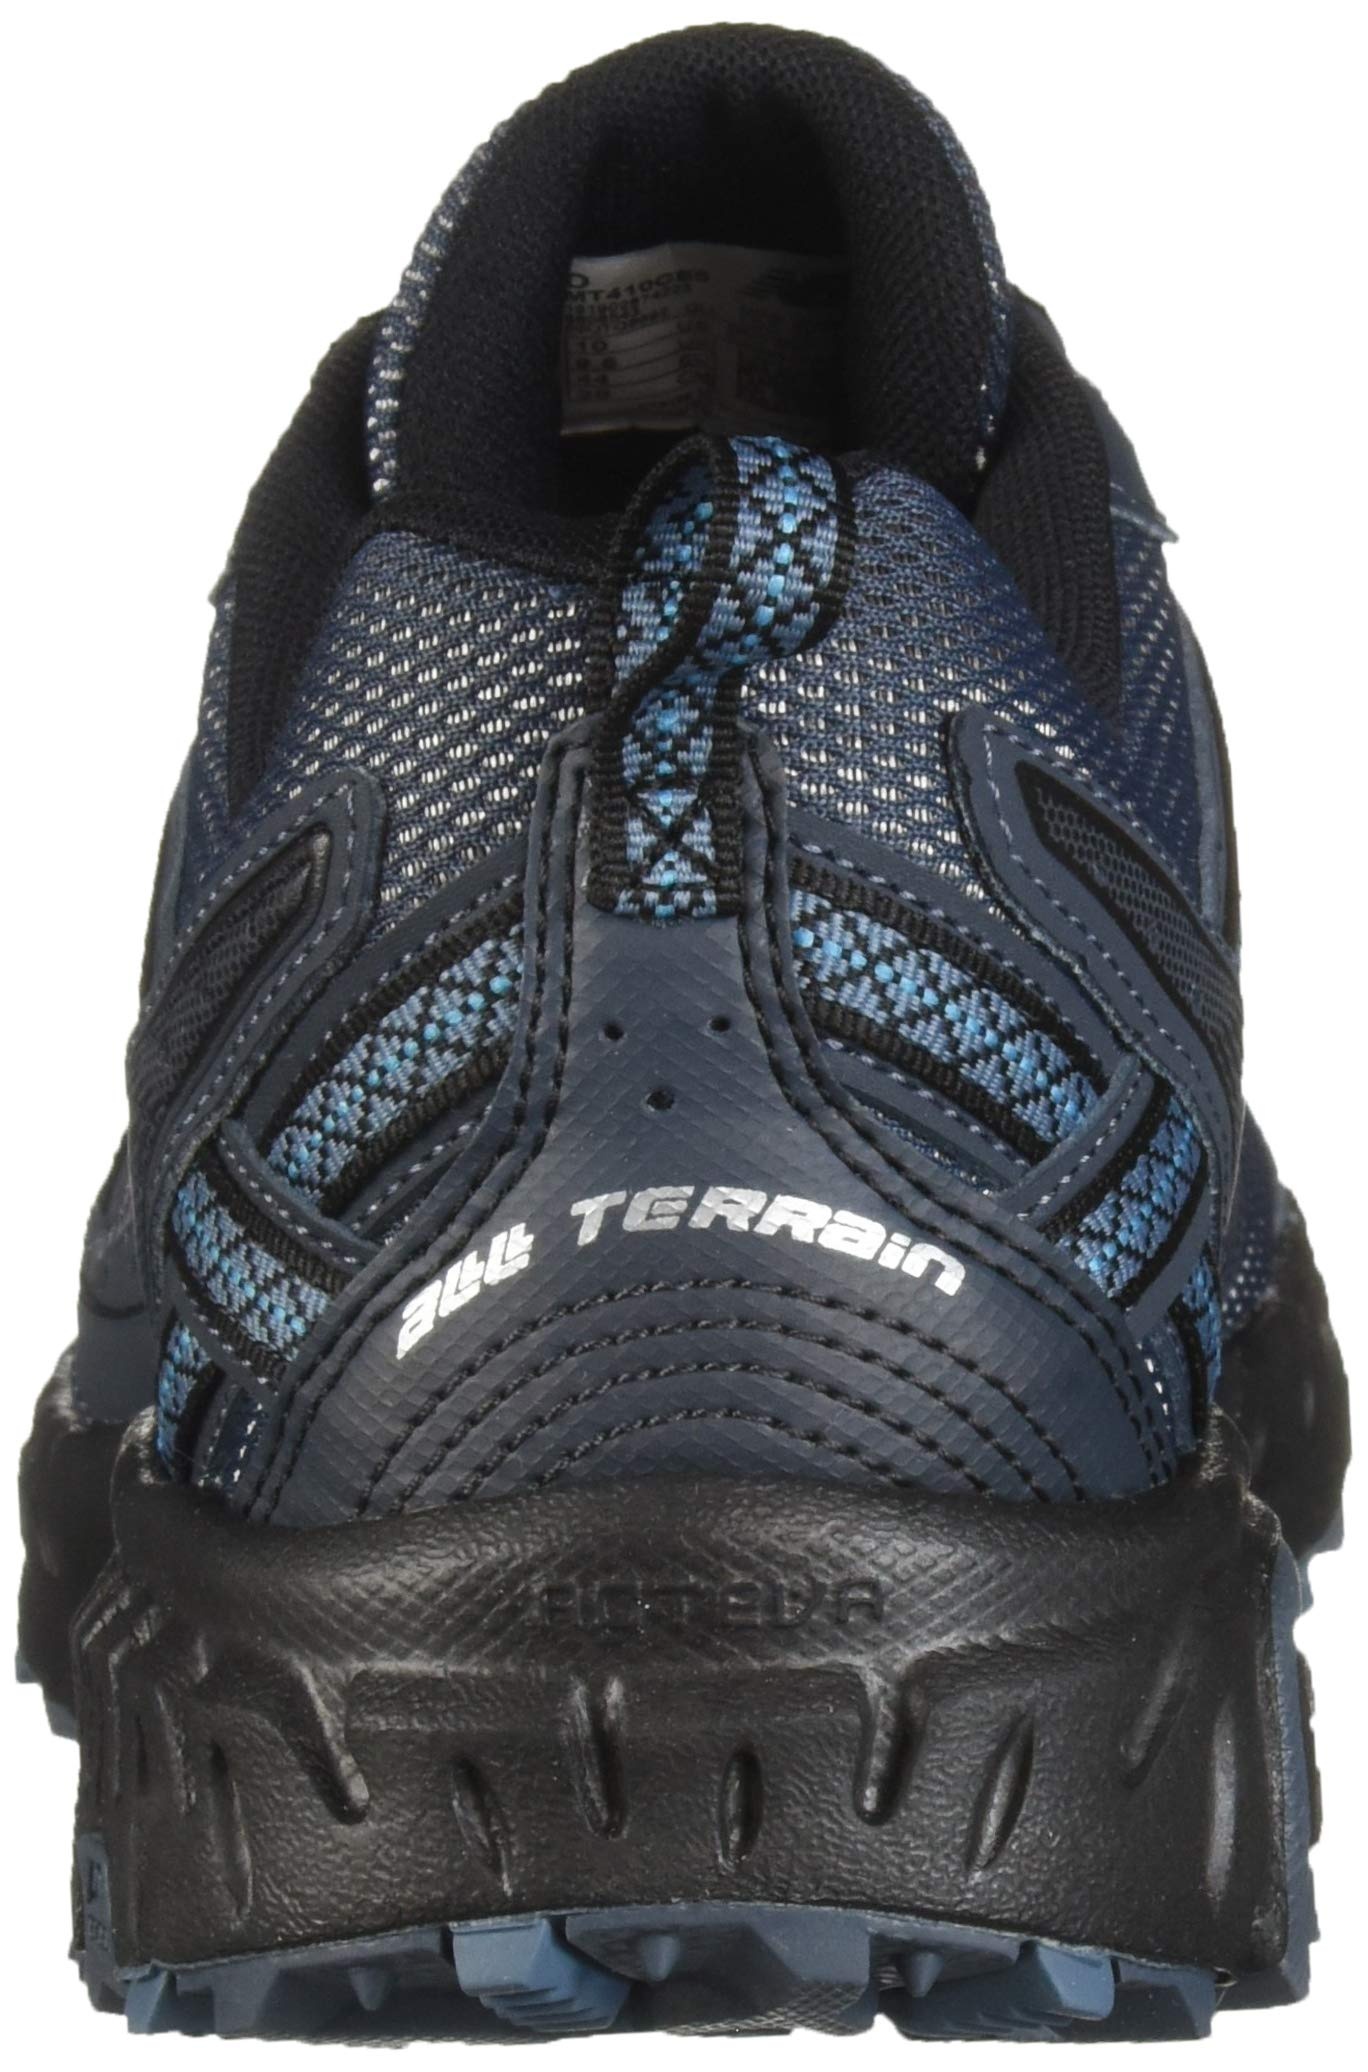 New Balance Men's 410v5 Cushioning Trail Running Shoe, Petrol/Cadet/Black, 7 D US by New Balance (Image #2)